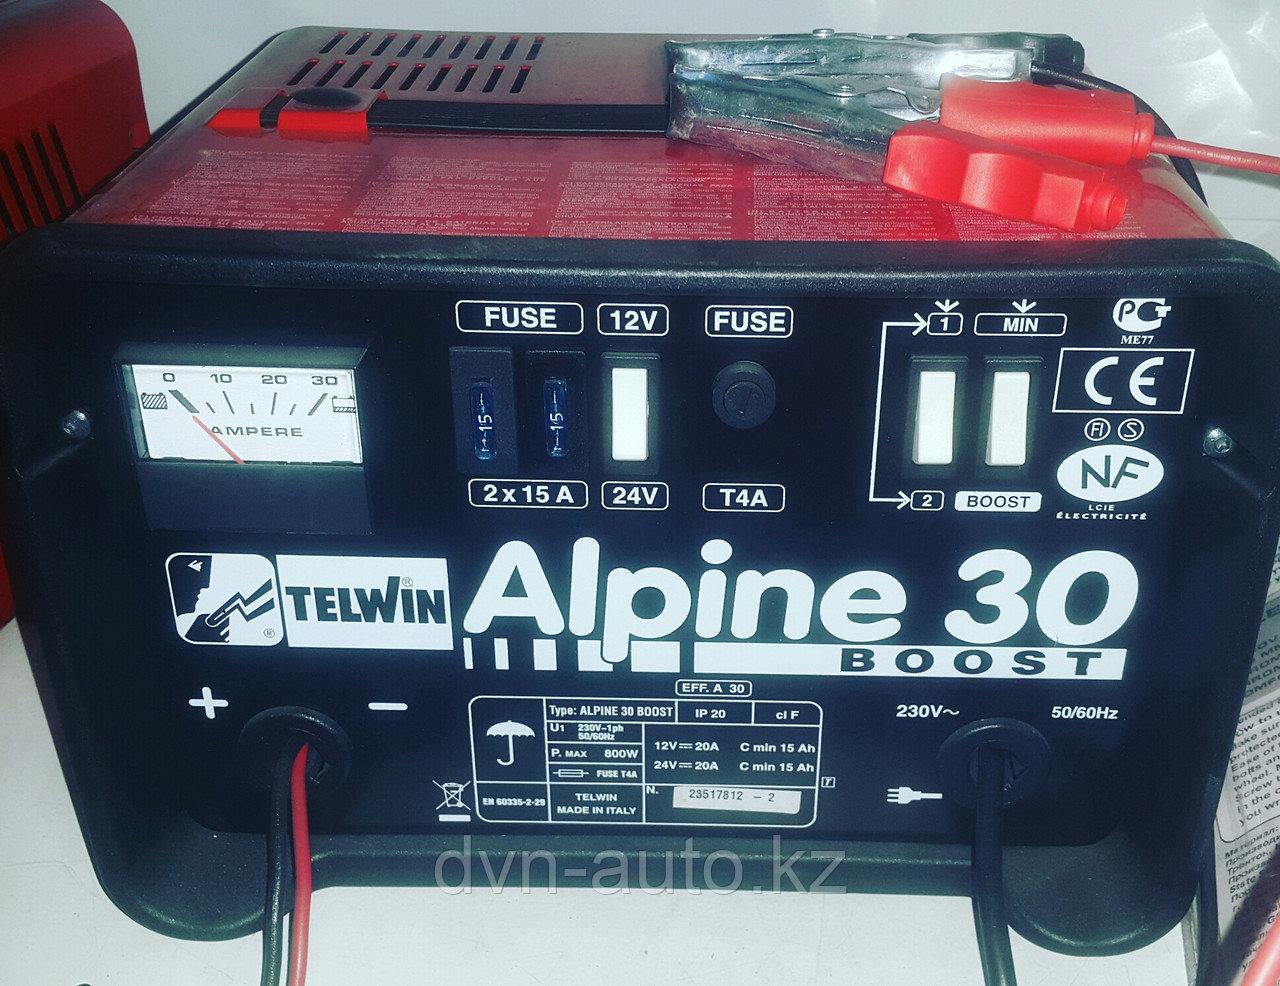 Telwin Alpine 30